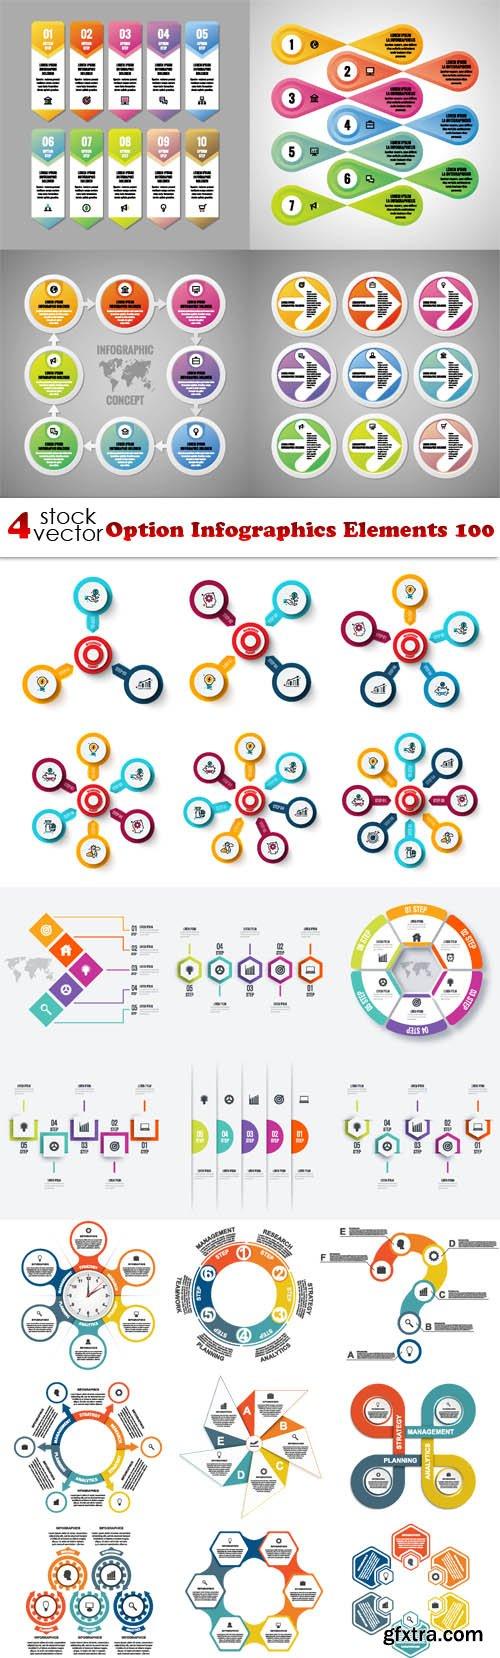 Vectors - Option Infographics Elements 100